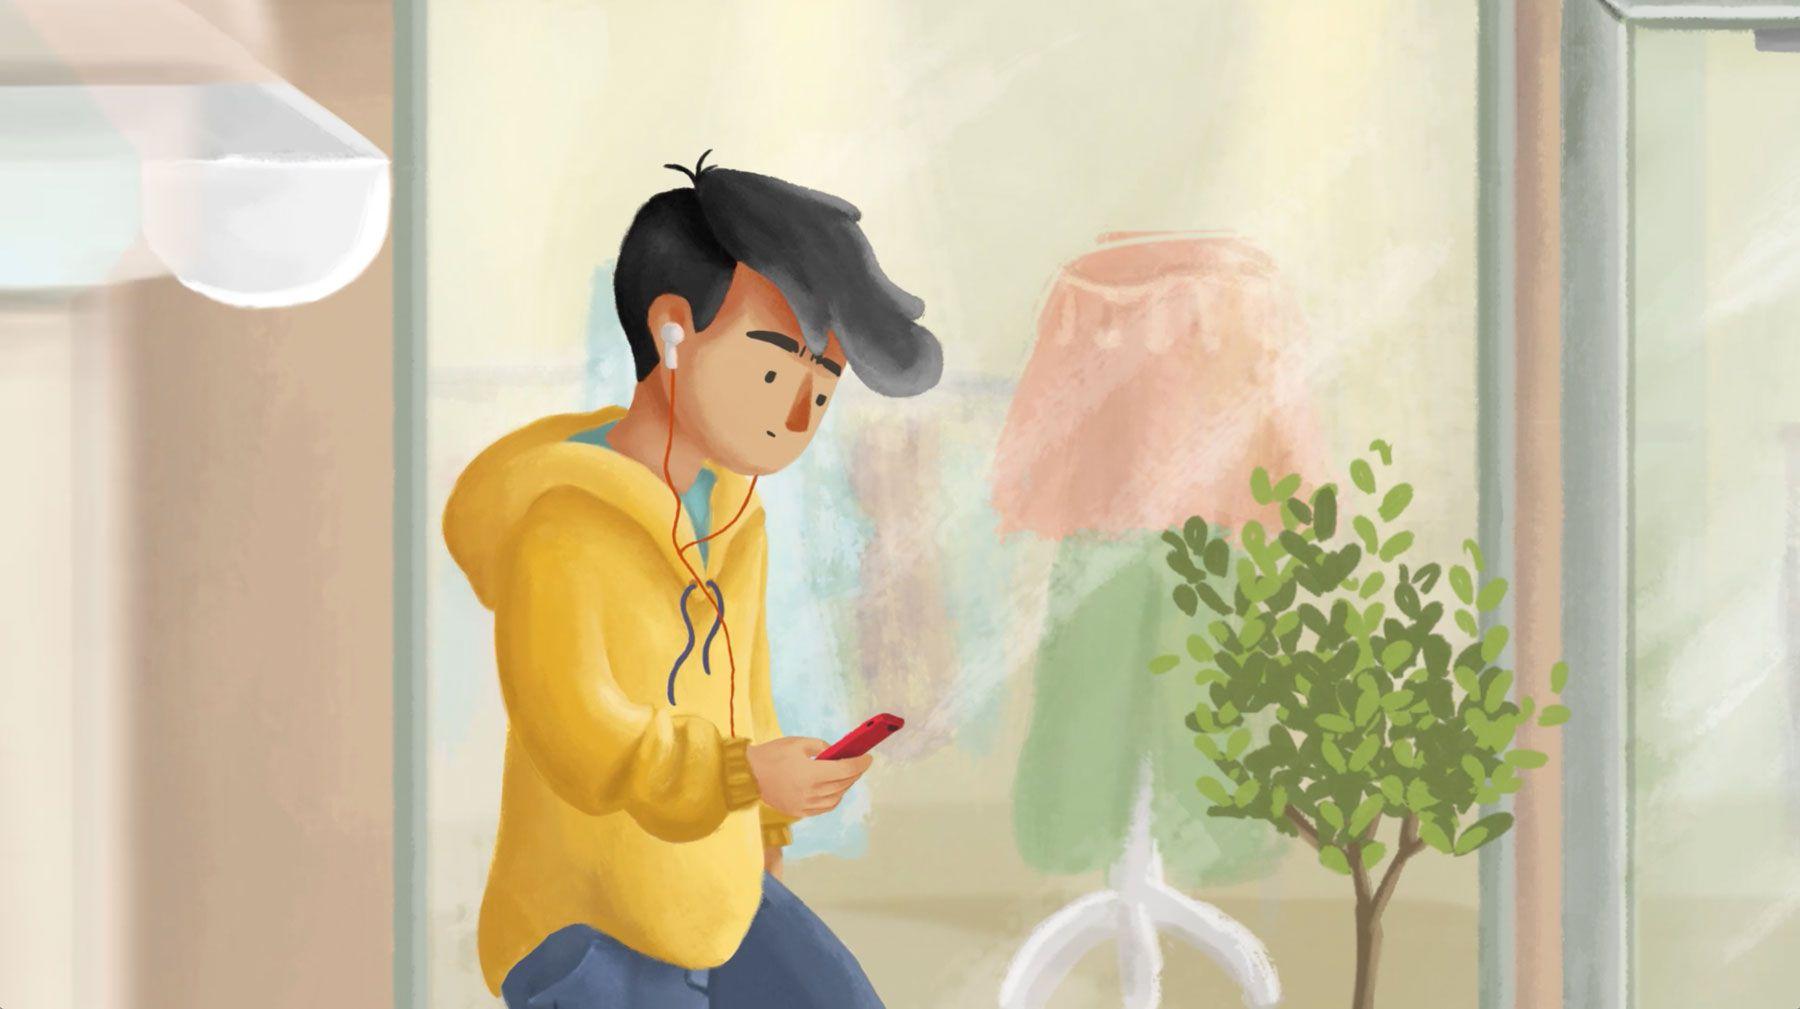 Digital illustration for animation - Character design